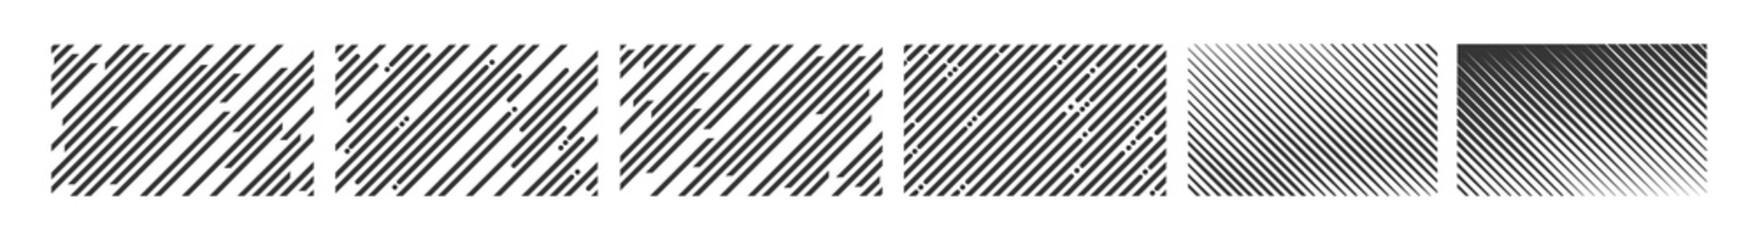 Fototapeta Diagonal or lines edgy pattern